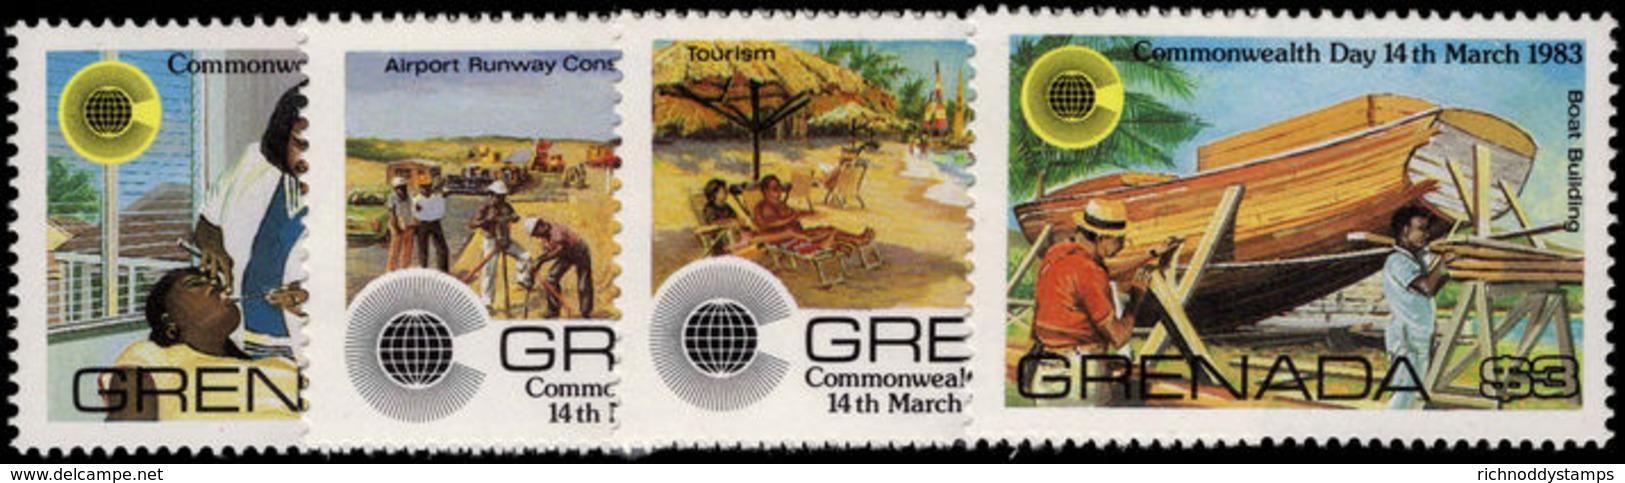 Grenada 1983 Commonwealth Day Unmounted Mint. - Grenada (1974-...)